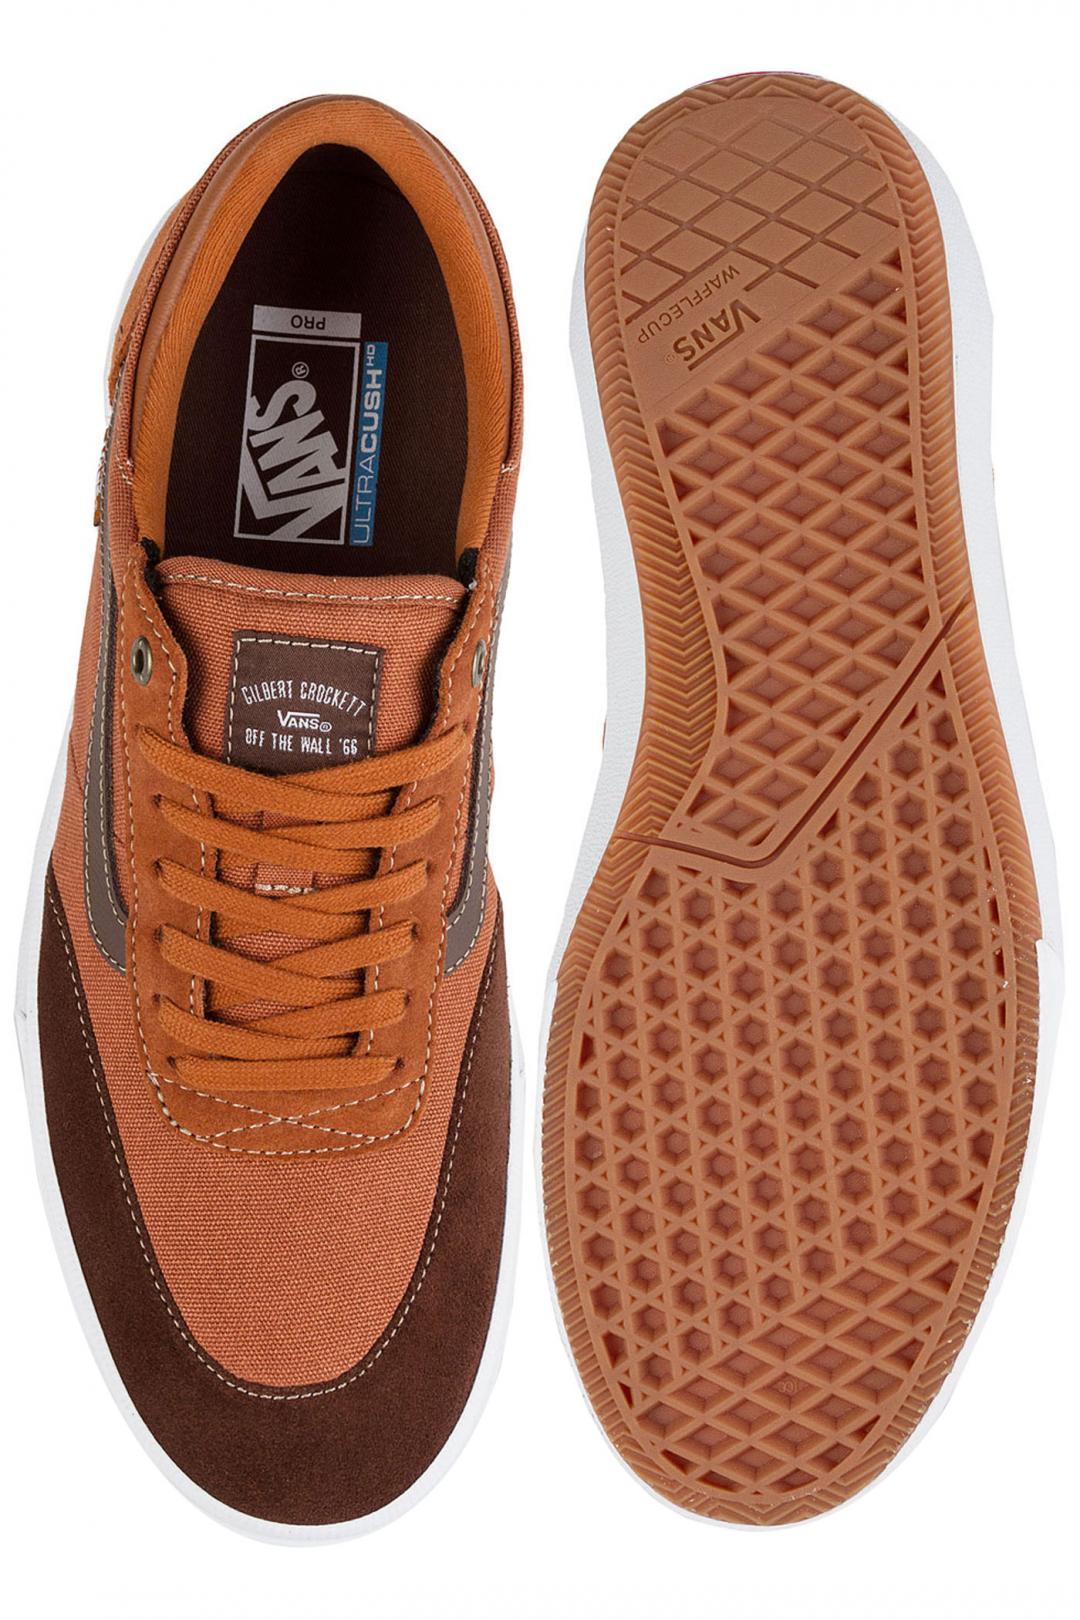 Uomo Vans Gilbert Crockett Pro 2 leather brown potting soil   Sneaker